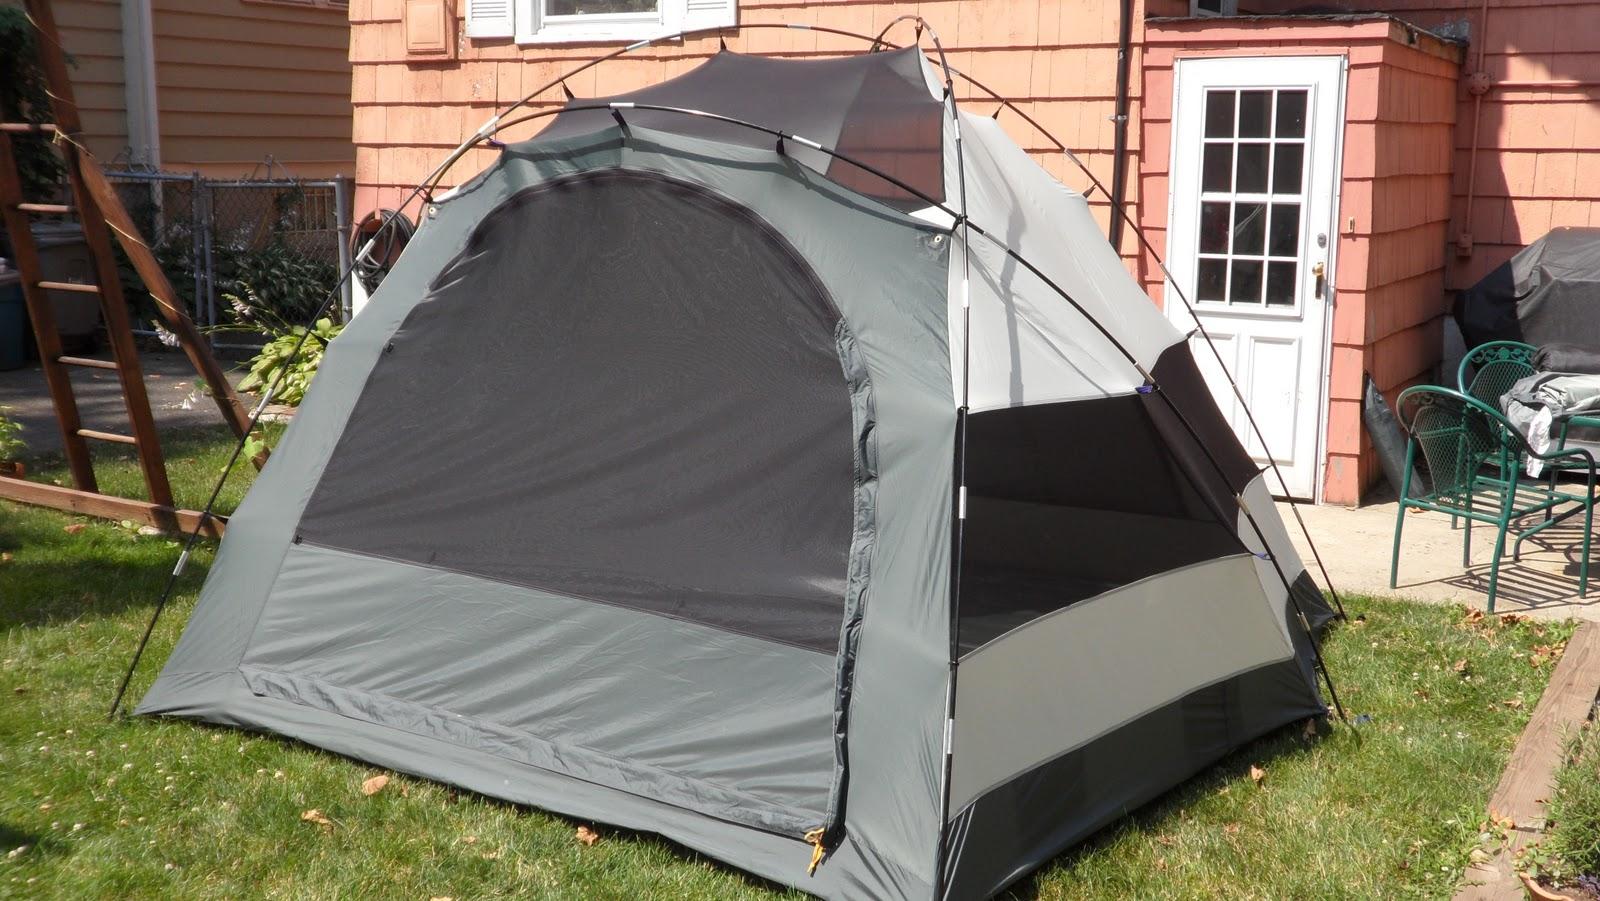 L.L. Bean Dome Tent 6 For Sale & L.L. Bean Dome Tent 6 For Sale: L.L. Bean Dome Tent 6 For Sale